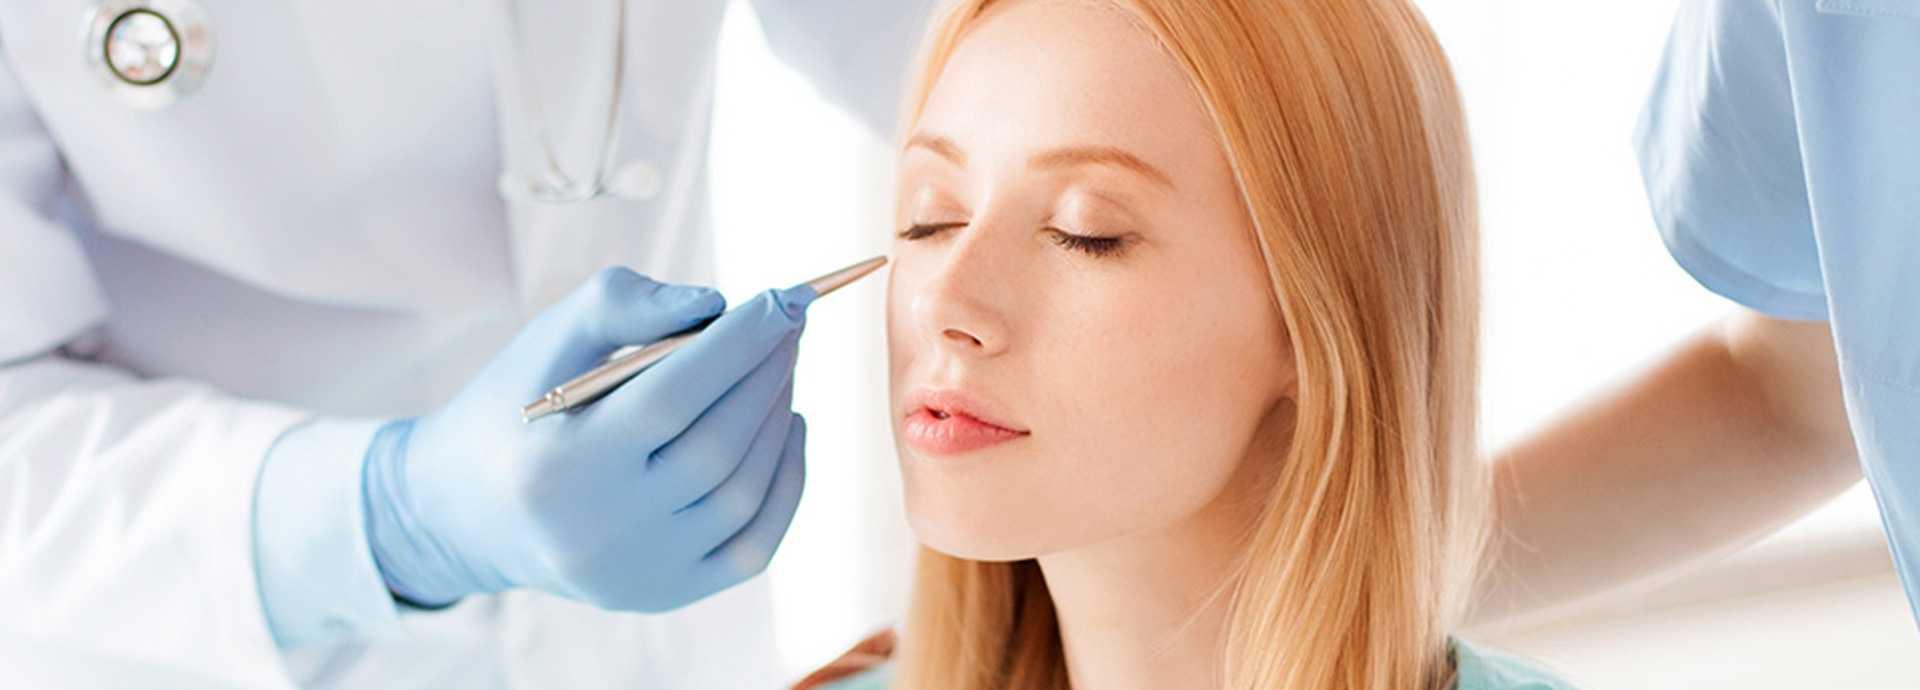 medical-dermatology-and-surgery-at-lane-dermatology-in-columbua